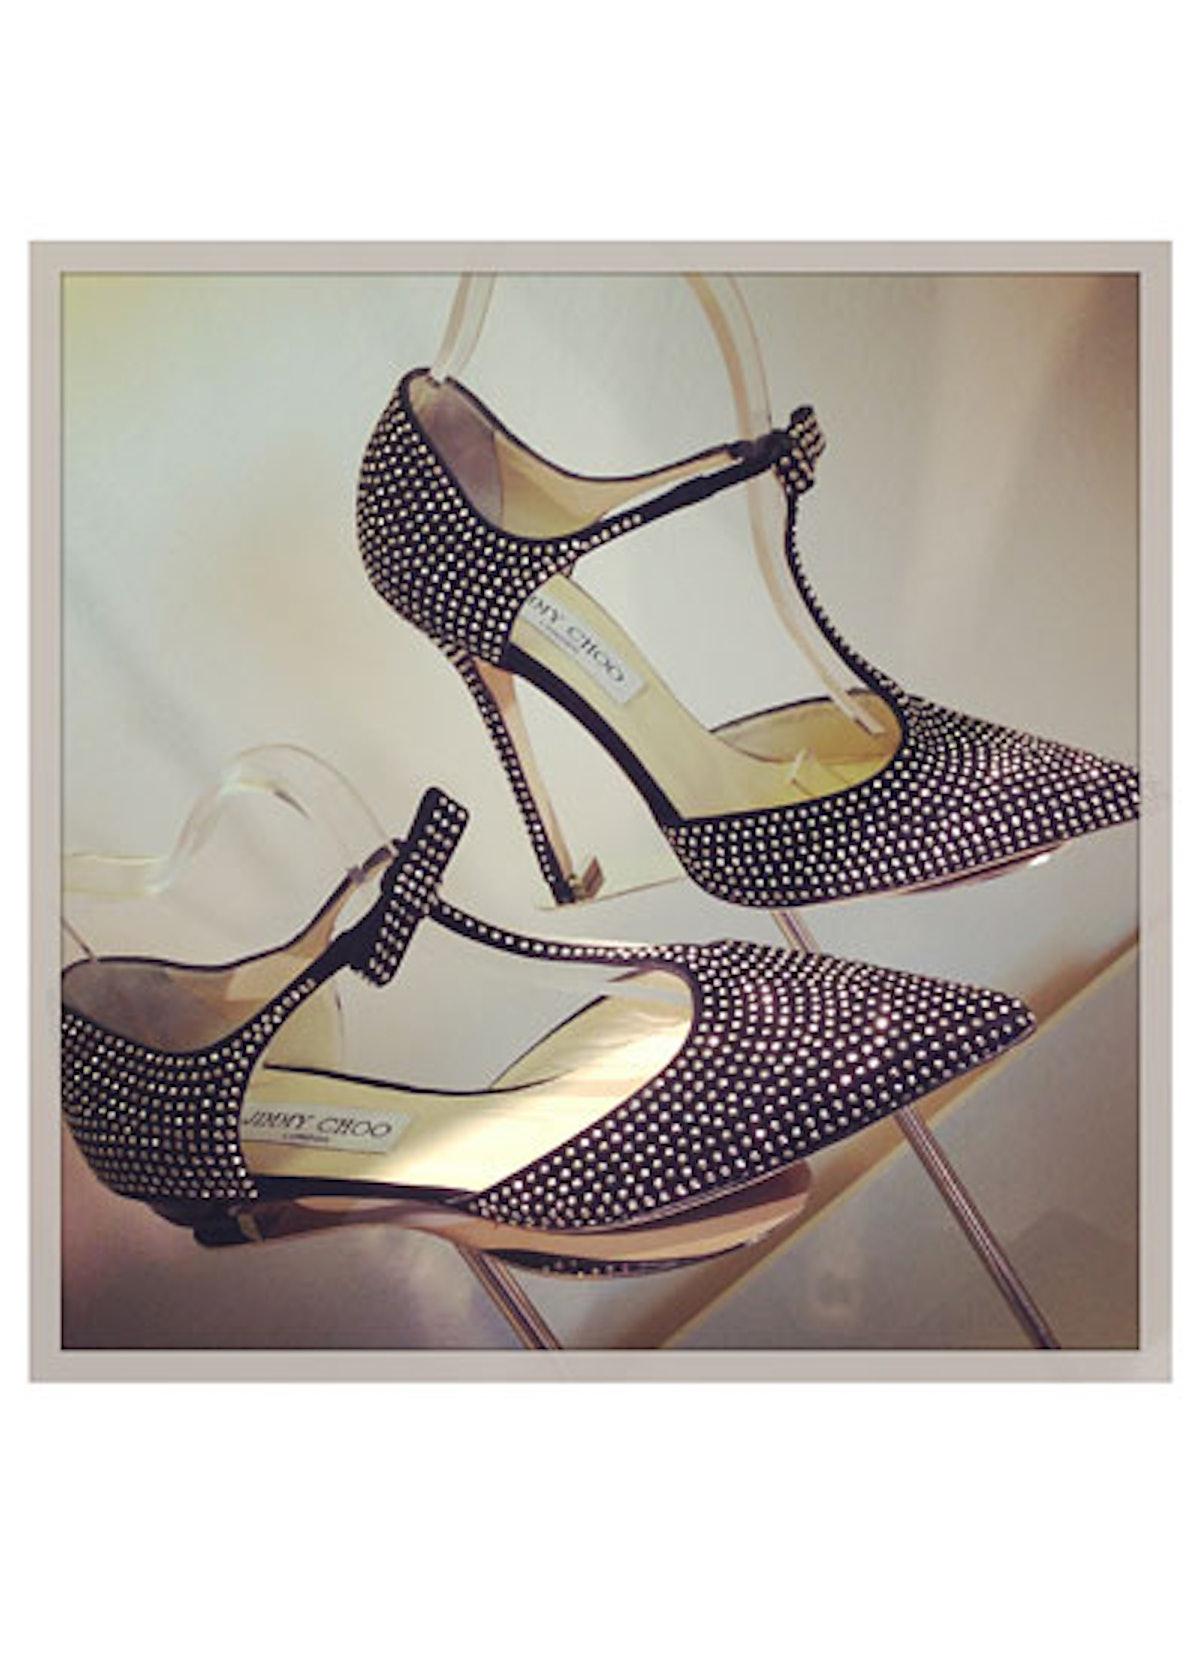 acss-best-shoes-fall-2013-02-v.jpg